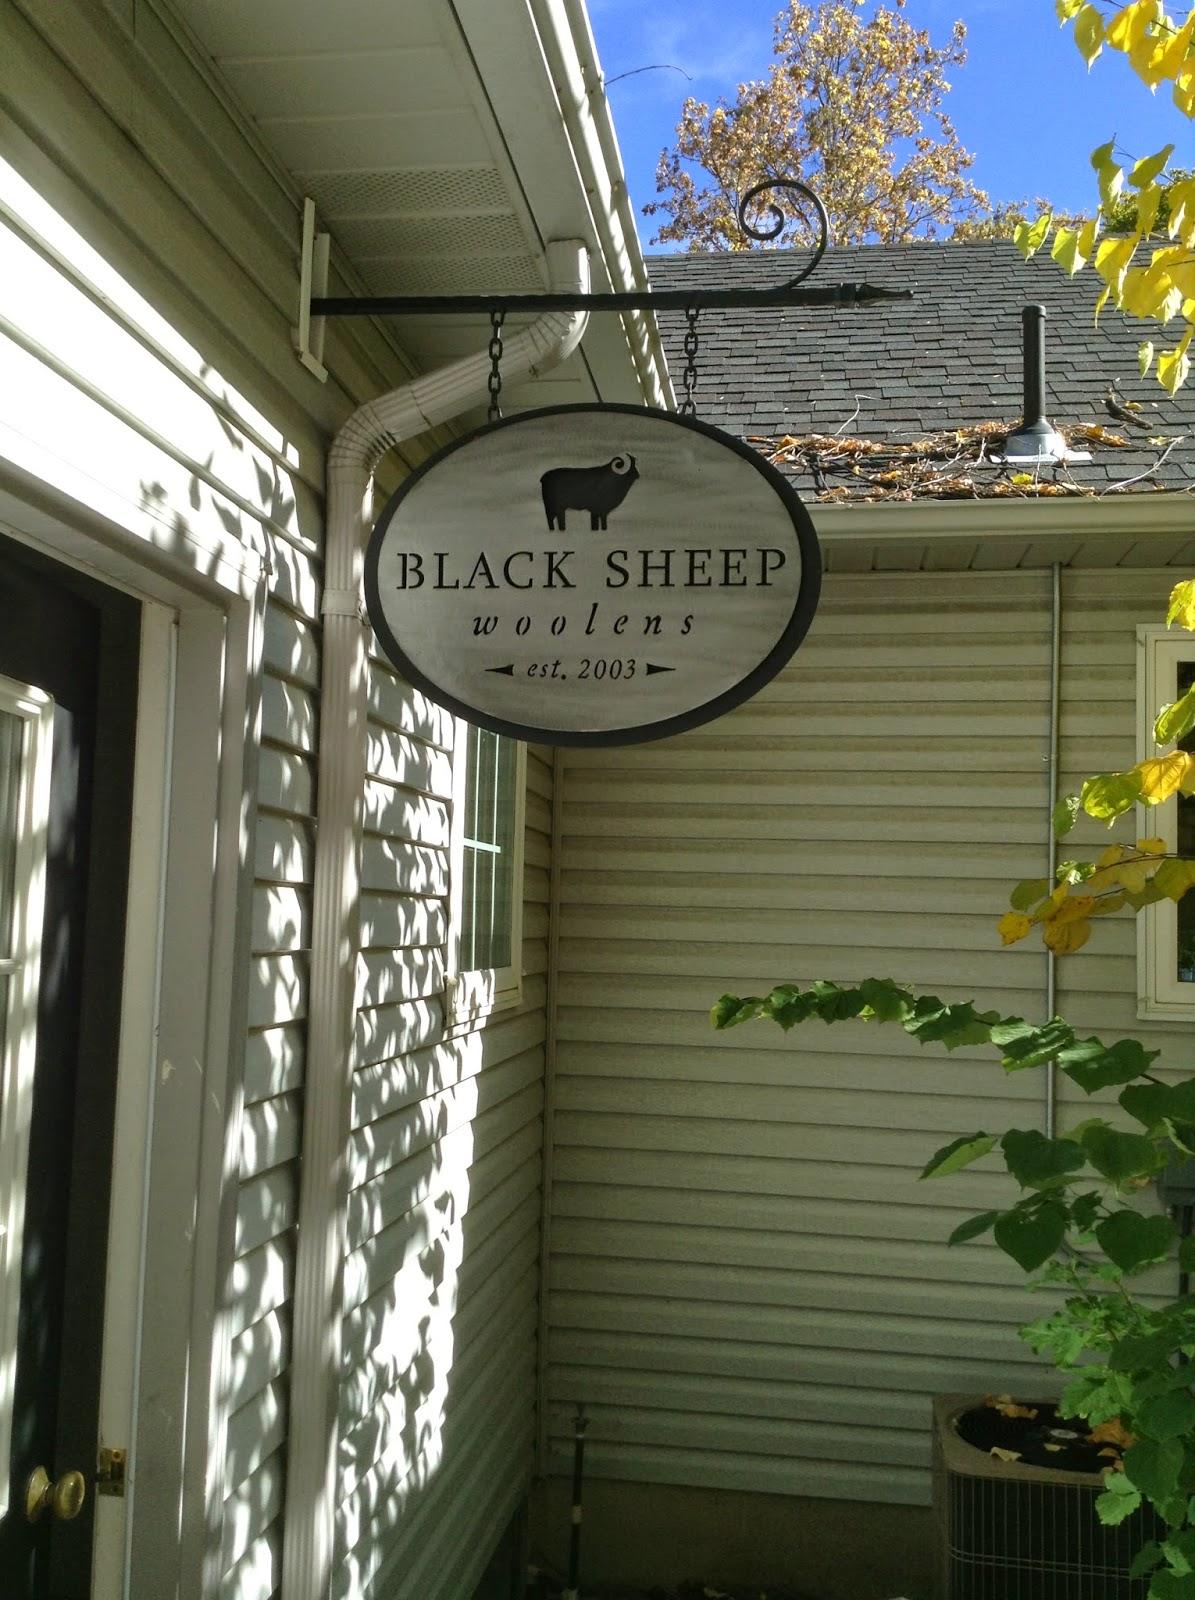 timeless traditions black sheep woolens. Black Bedroom Furniture Sets. Home Design Ideas